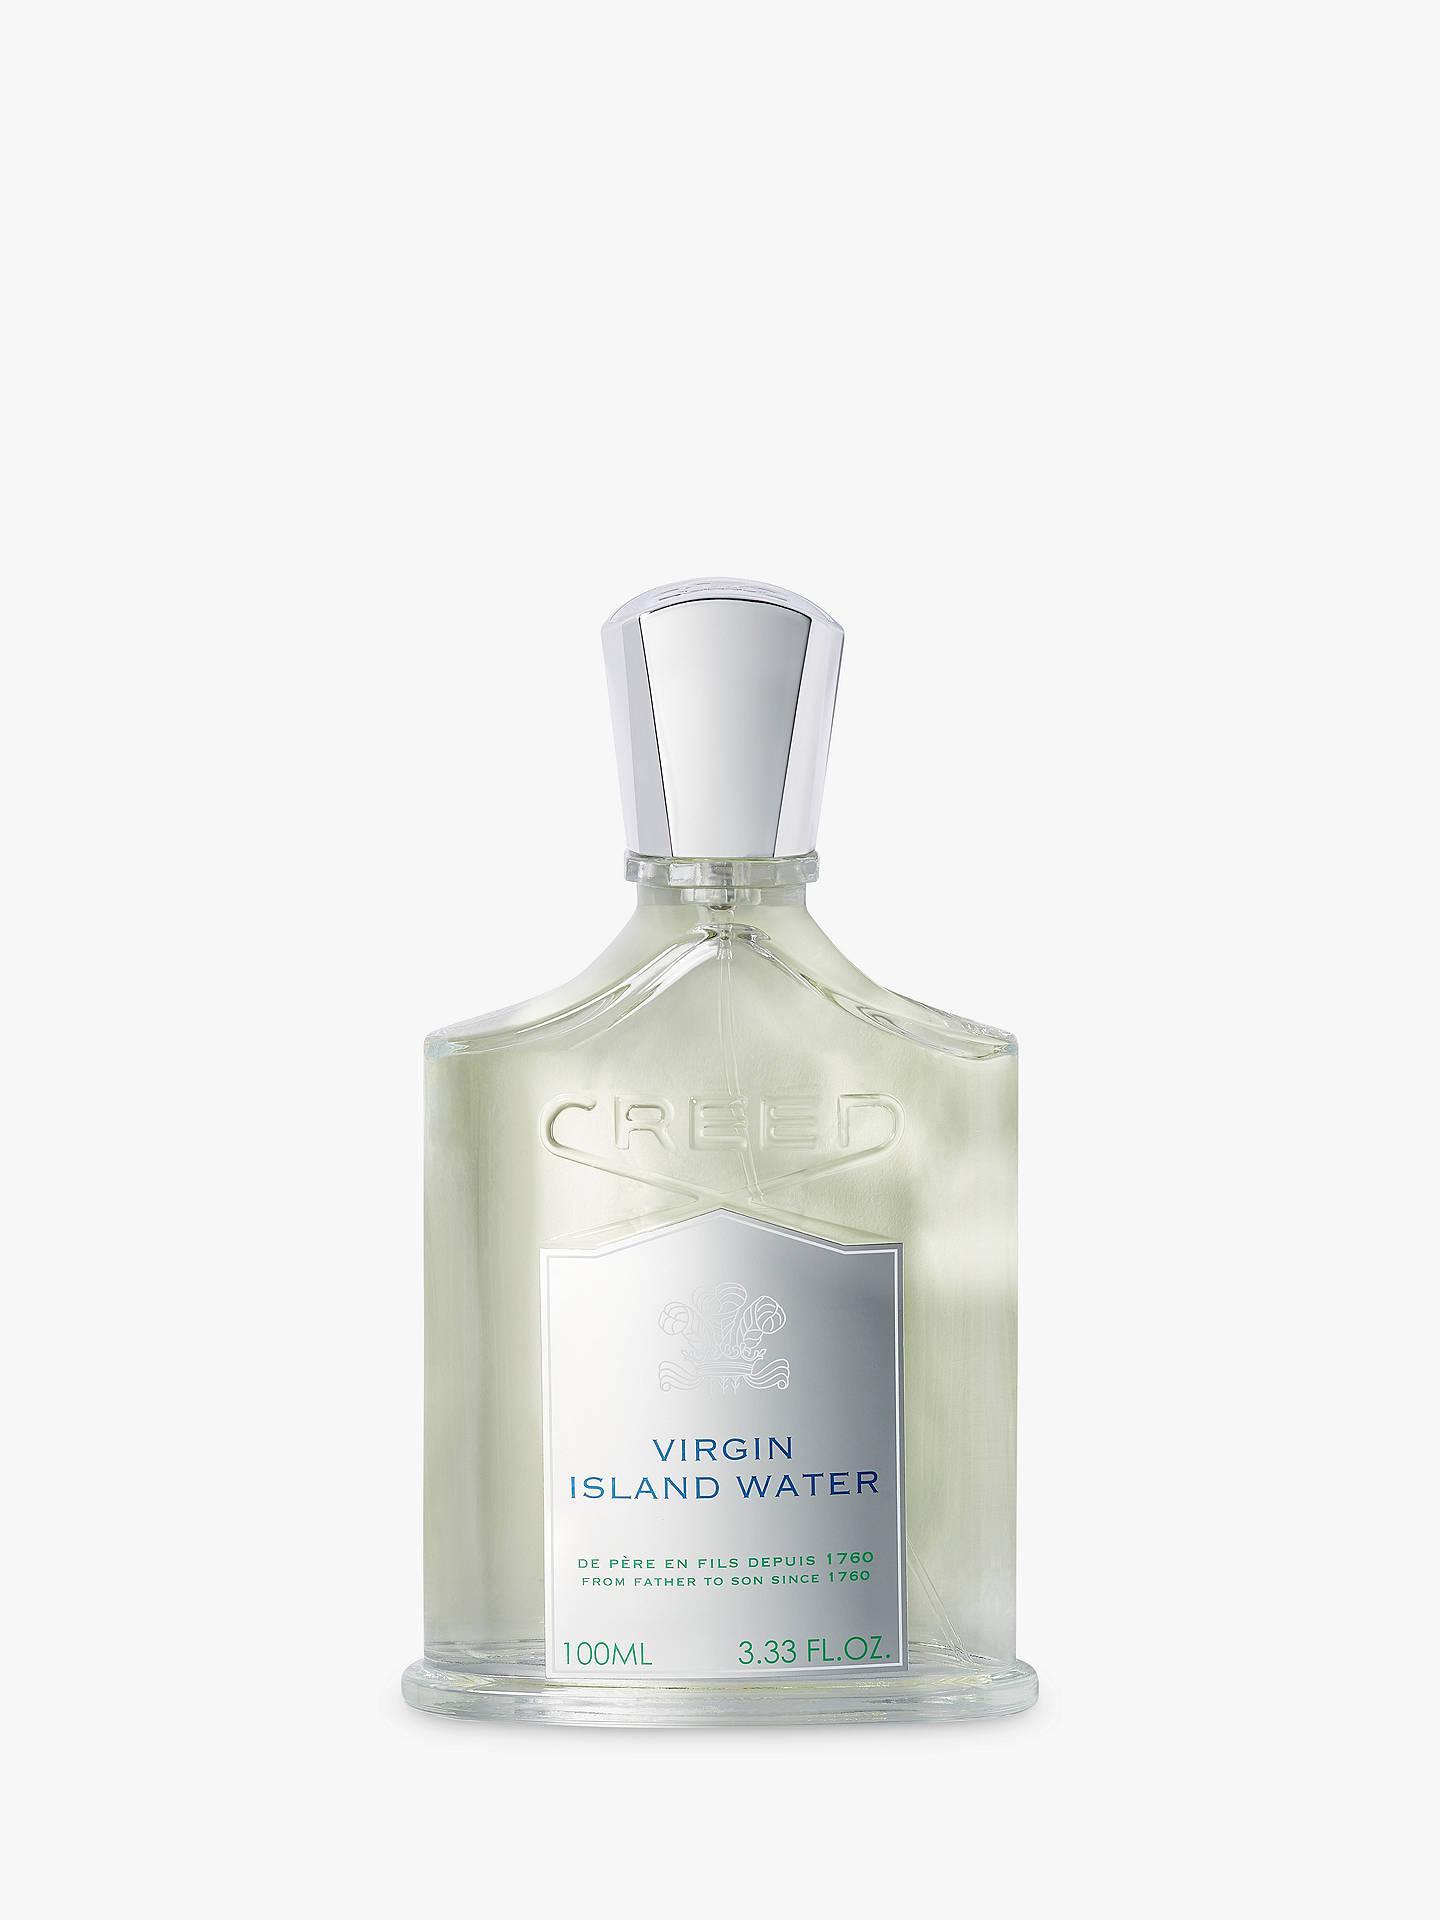 e3798b45cc58 Buy CREED Virgin Island Water Eau de Parfum, 100ml Online at johnlewis.com